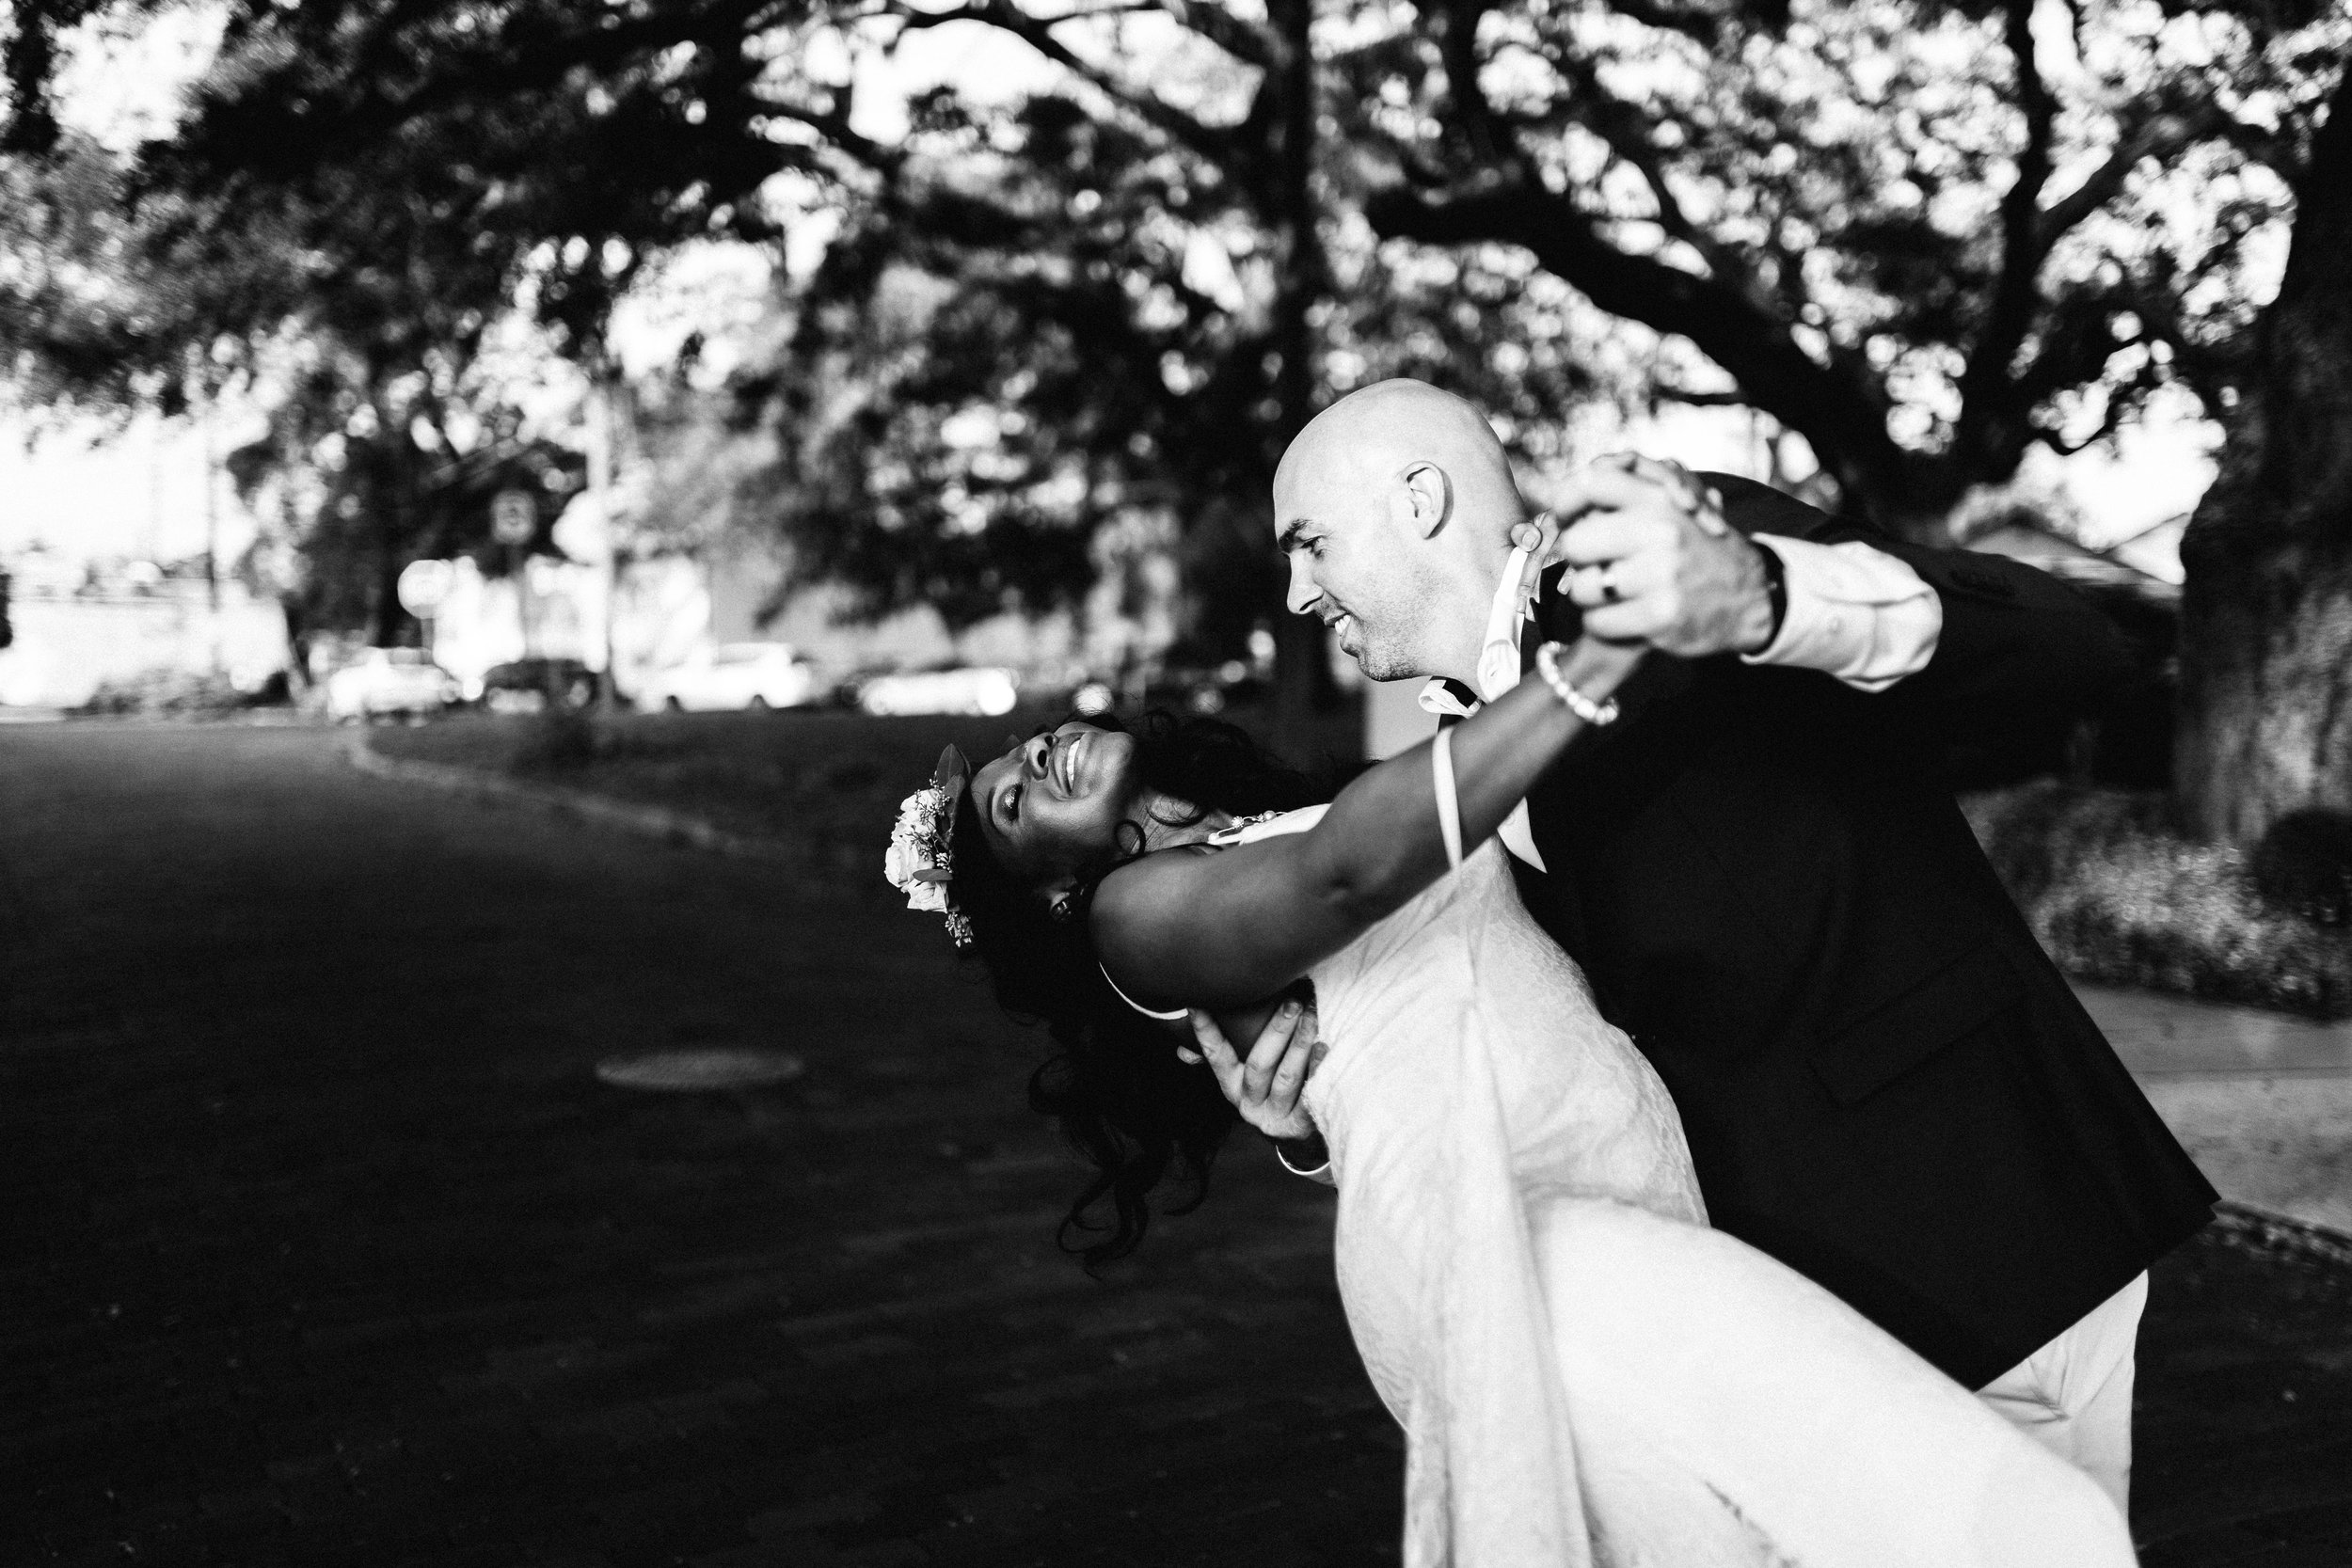 2017.09.16 Ashley and Chuck O'Day Quantam Leap Winery Wedding (428 of 462).jpg